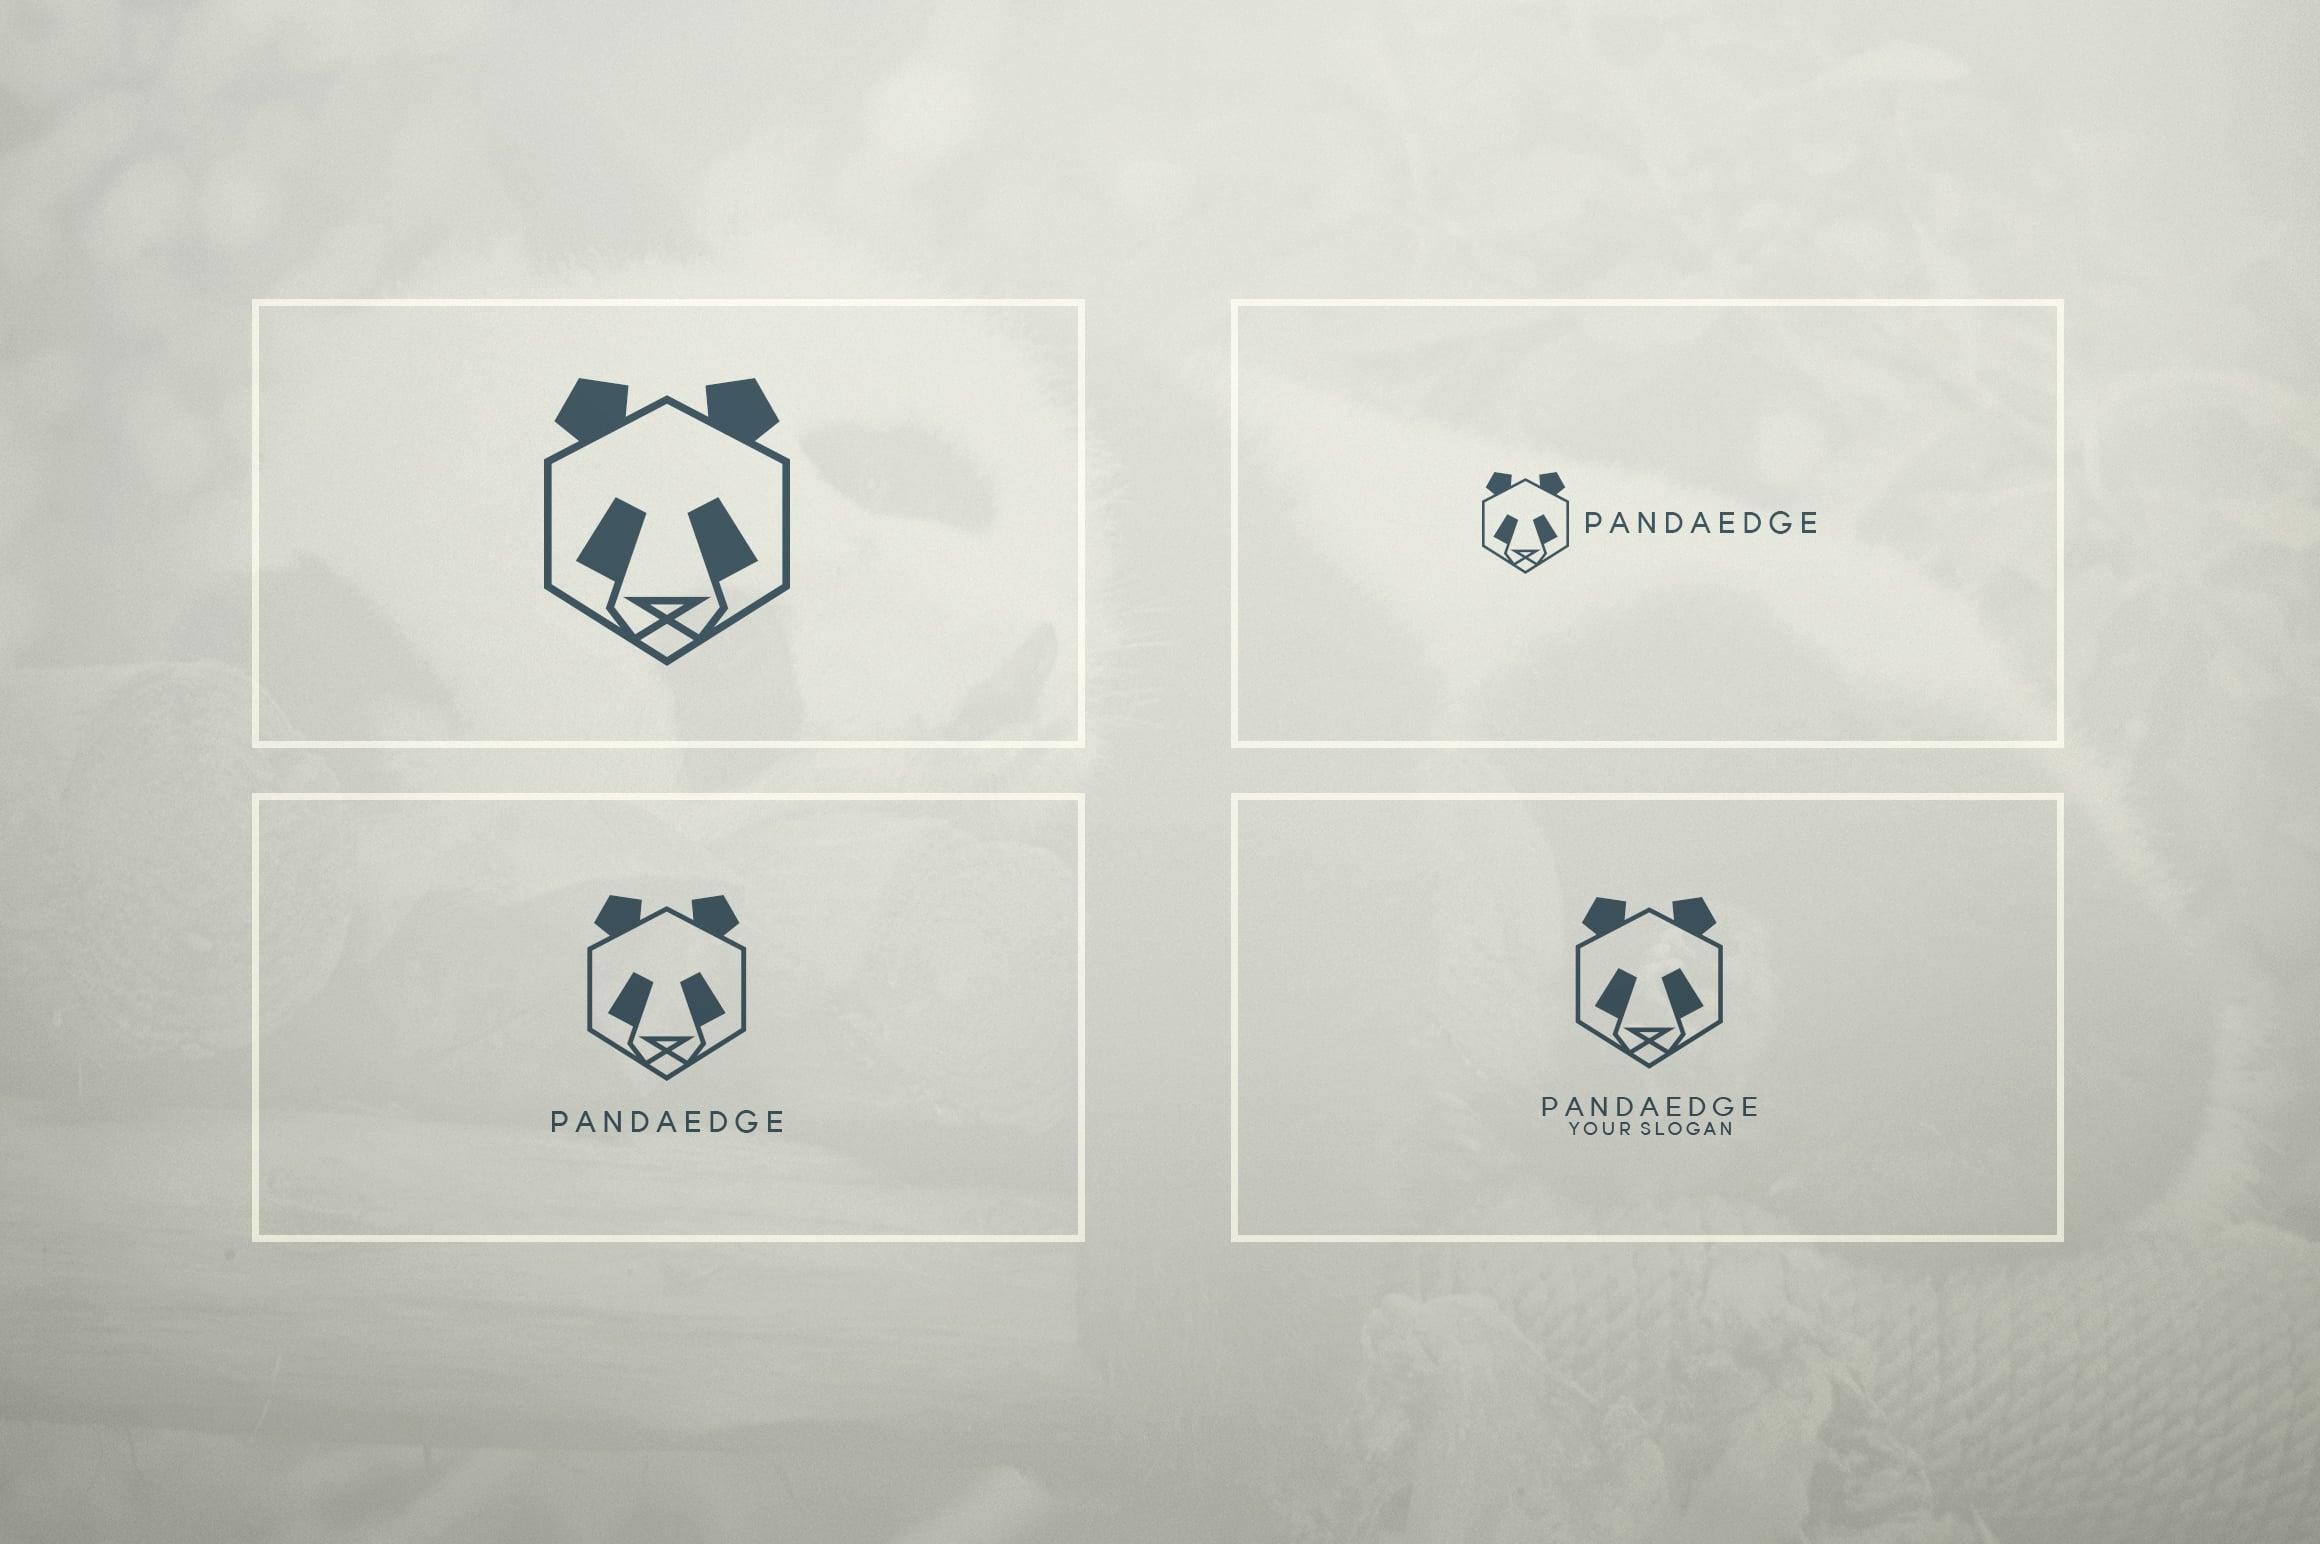 17 Geometric Animal Icons and Logos - 21